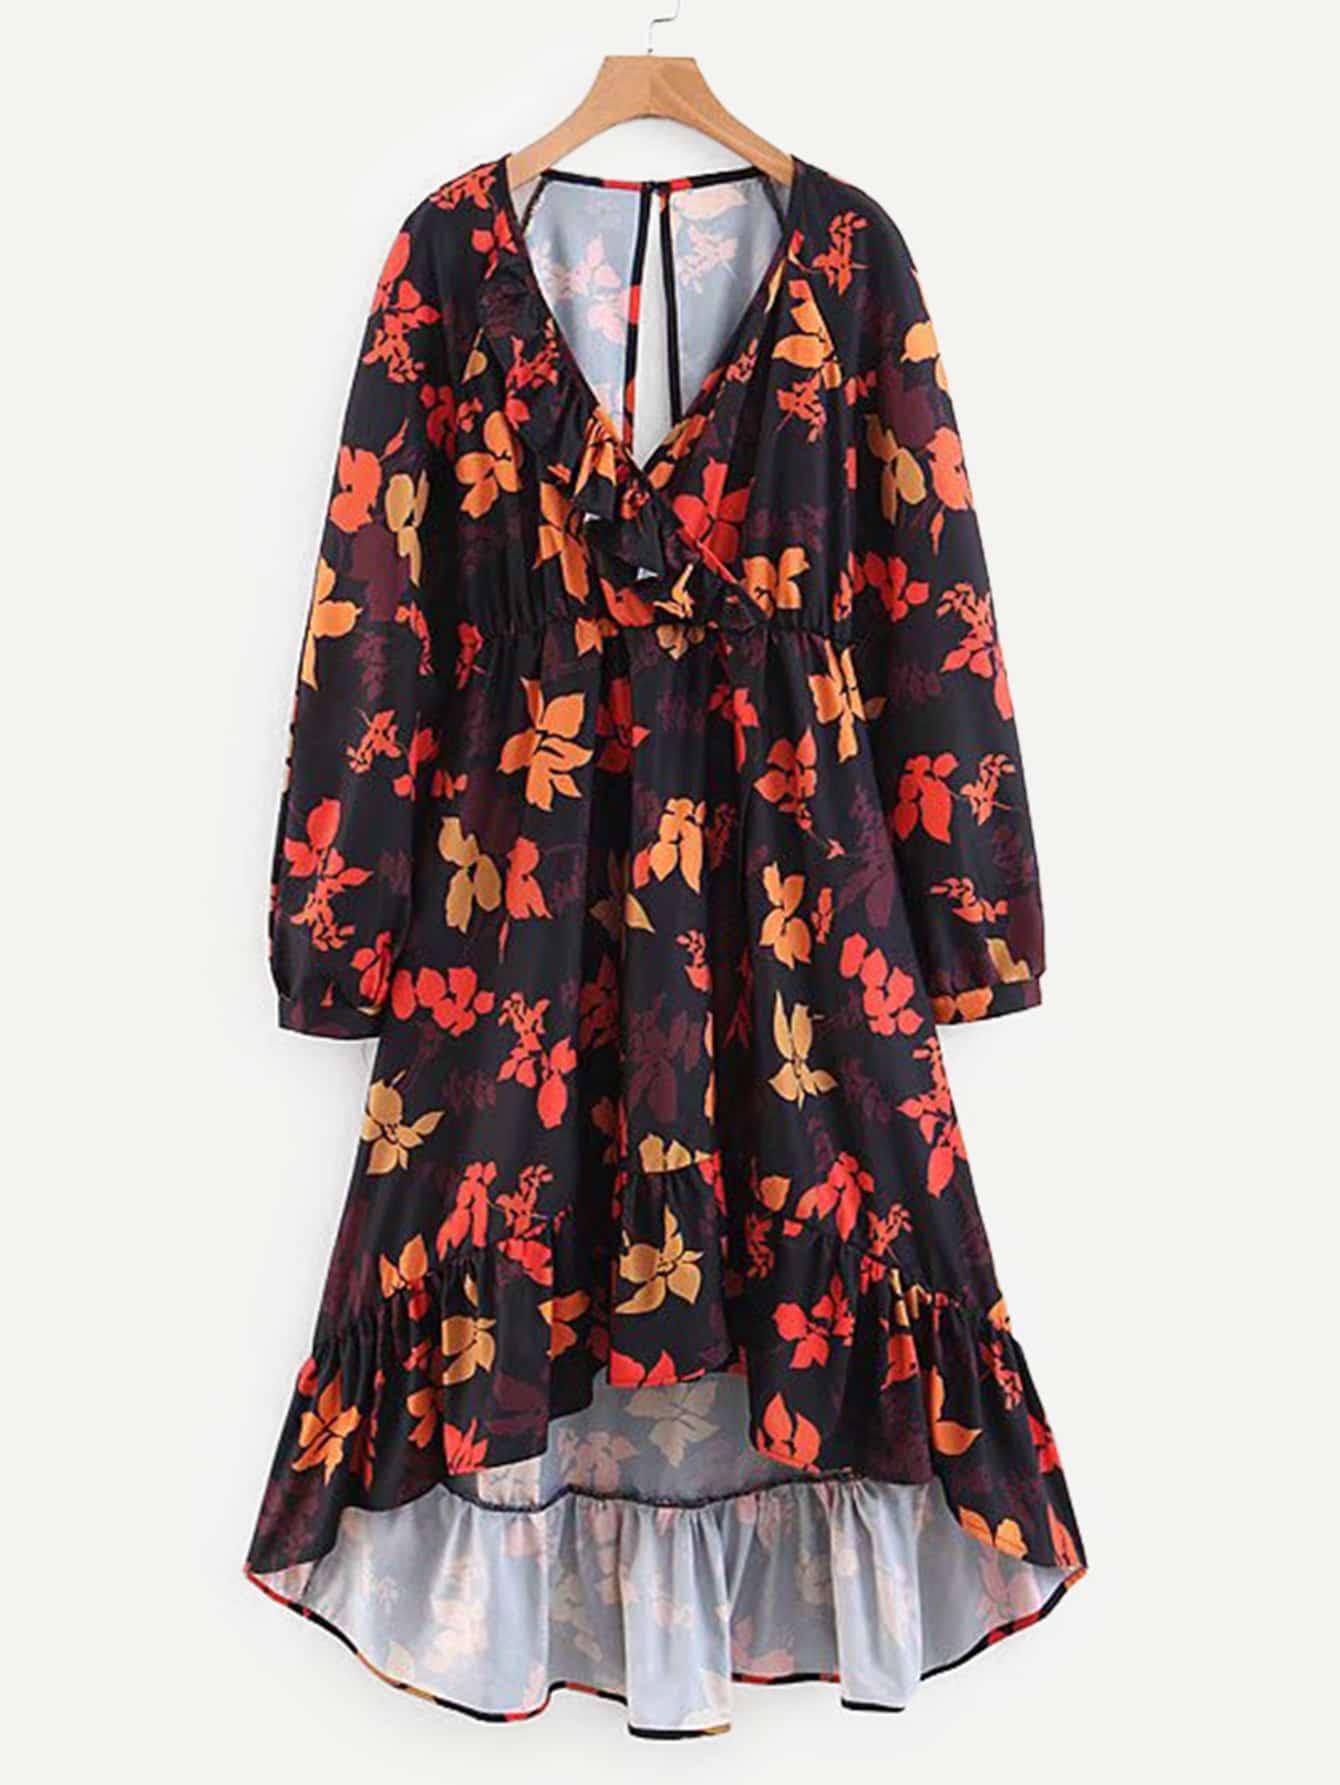 Maple Leaf Print Ruffle Hem Dress Maple Leaf Print Ruffle Hem Dress